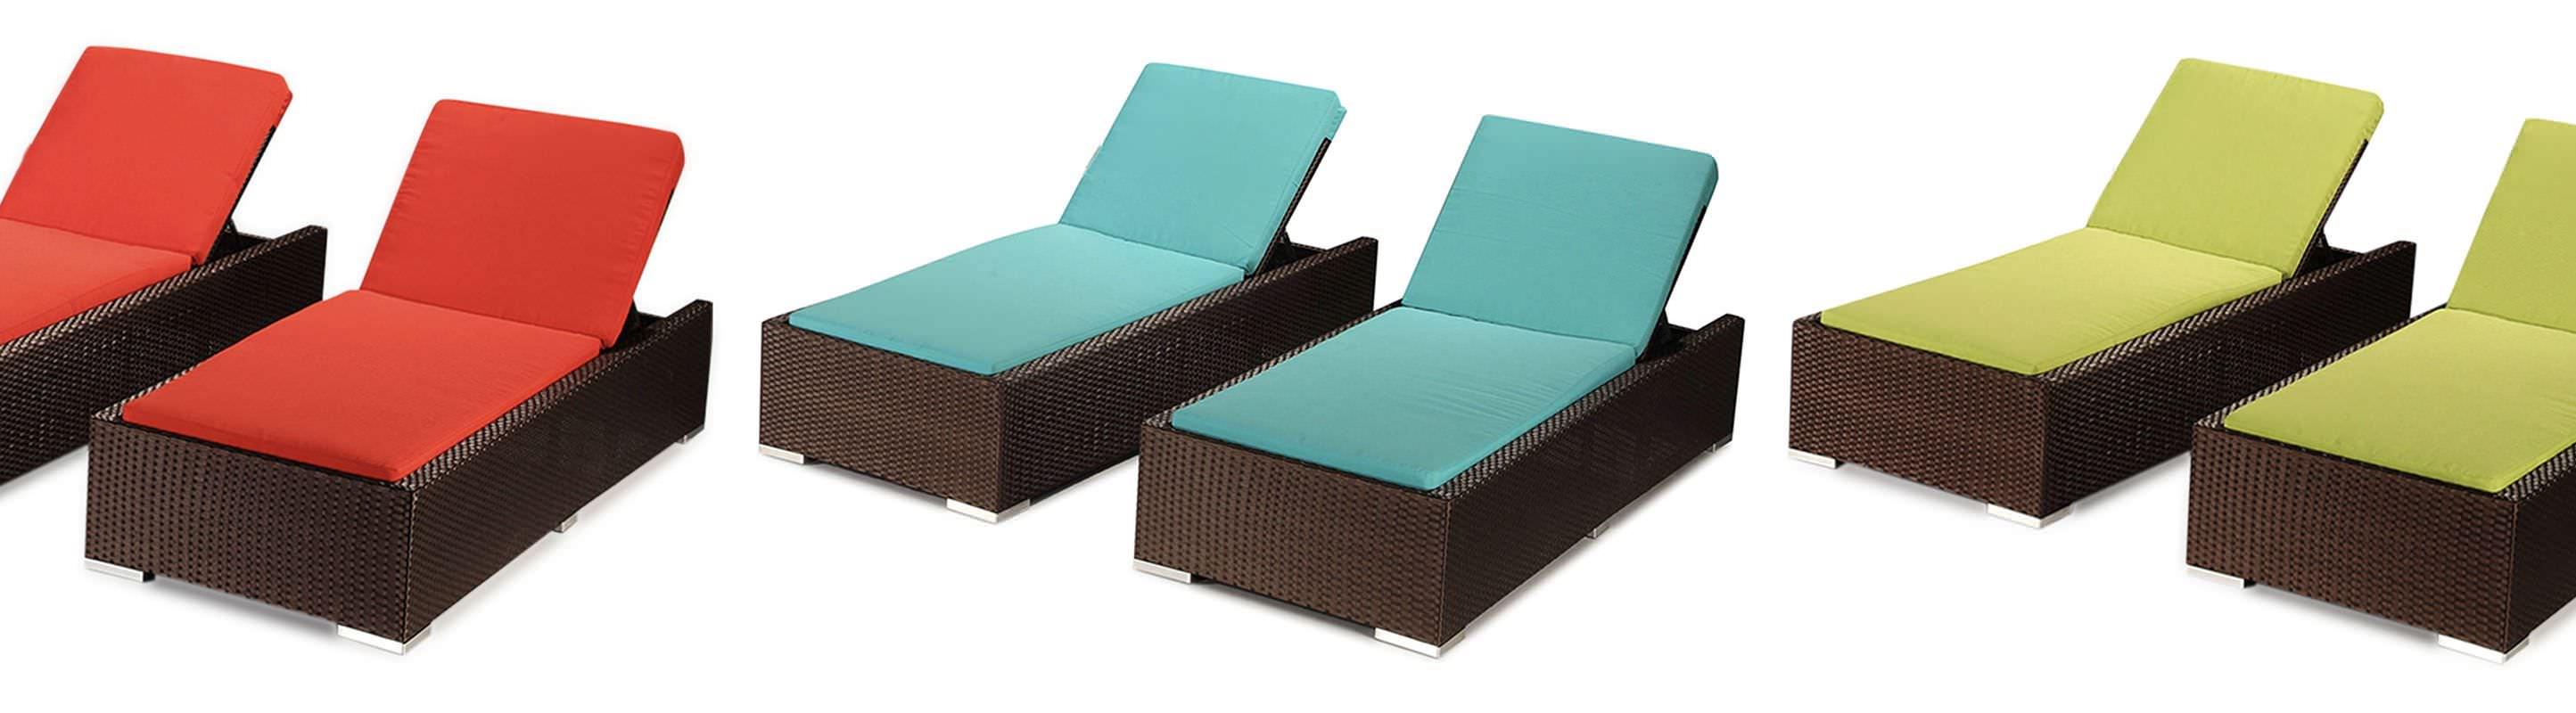 aloha hanalei chaise lounge modern outdoor